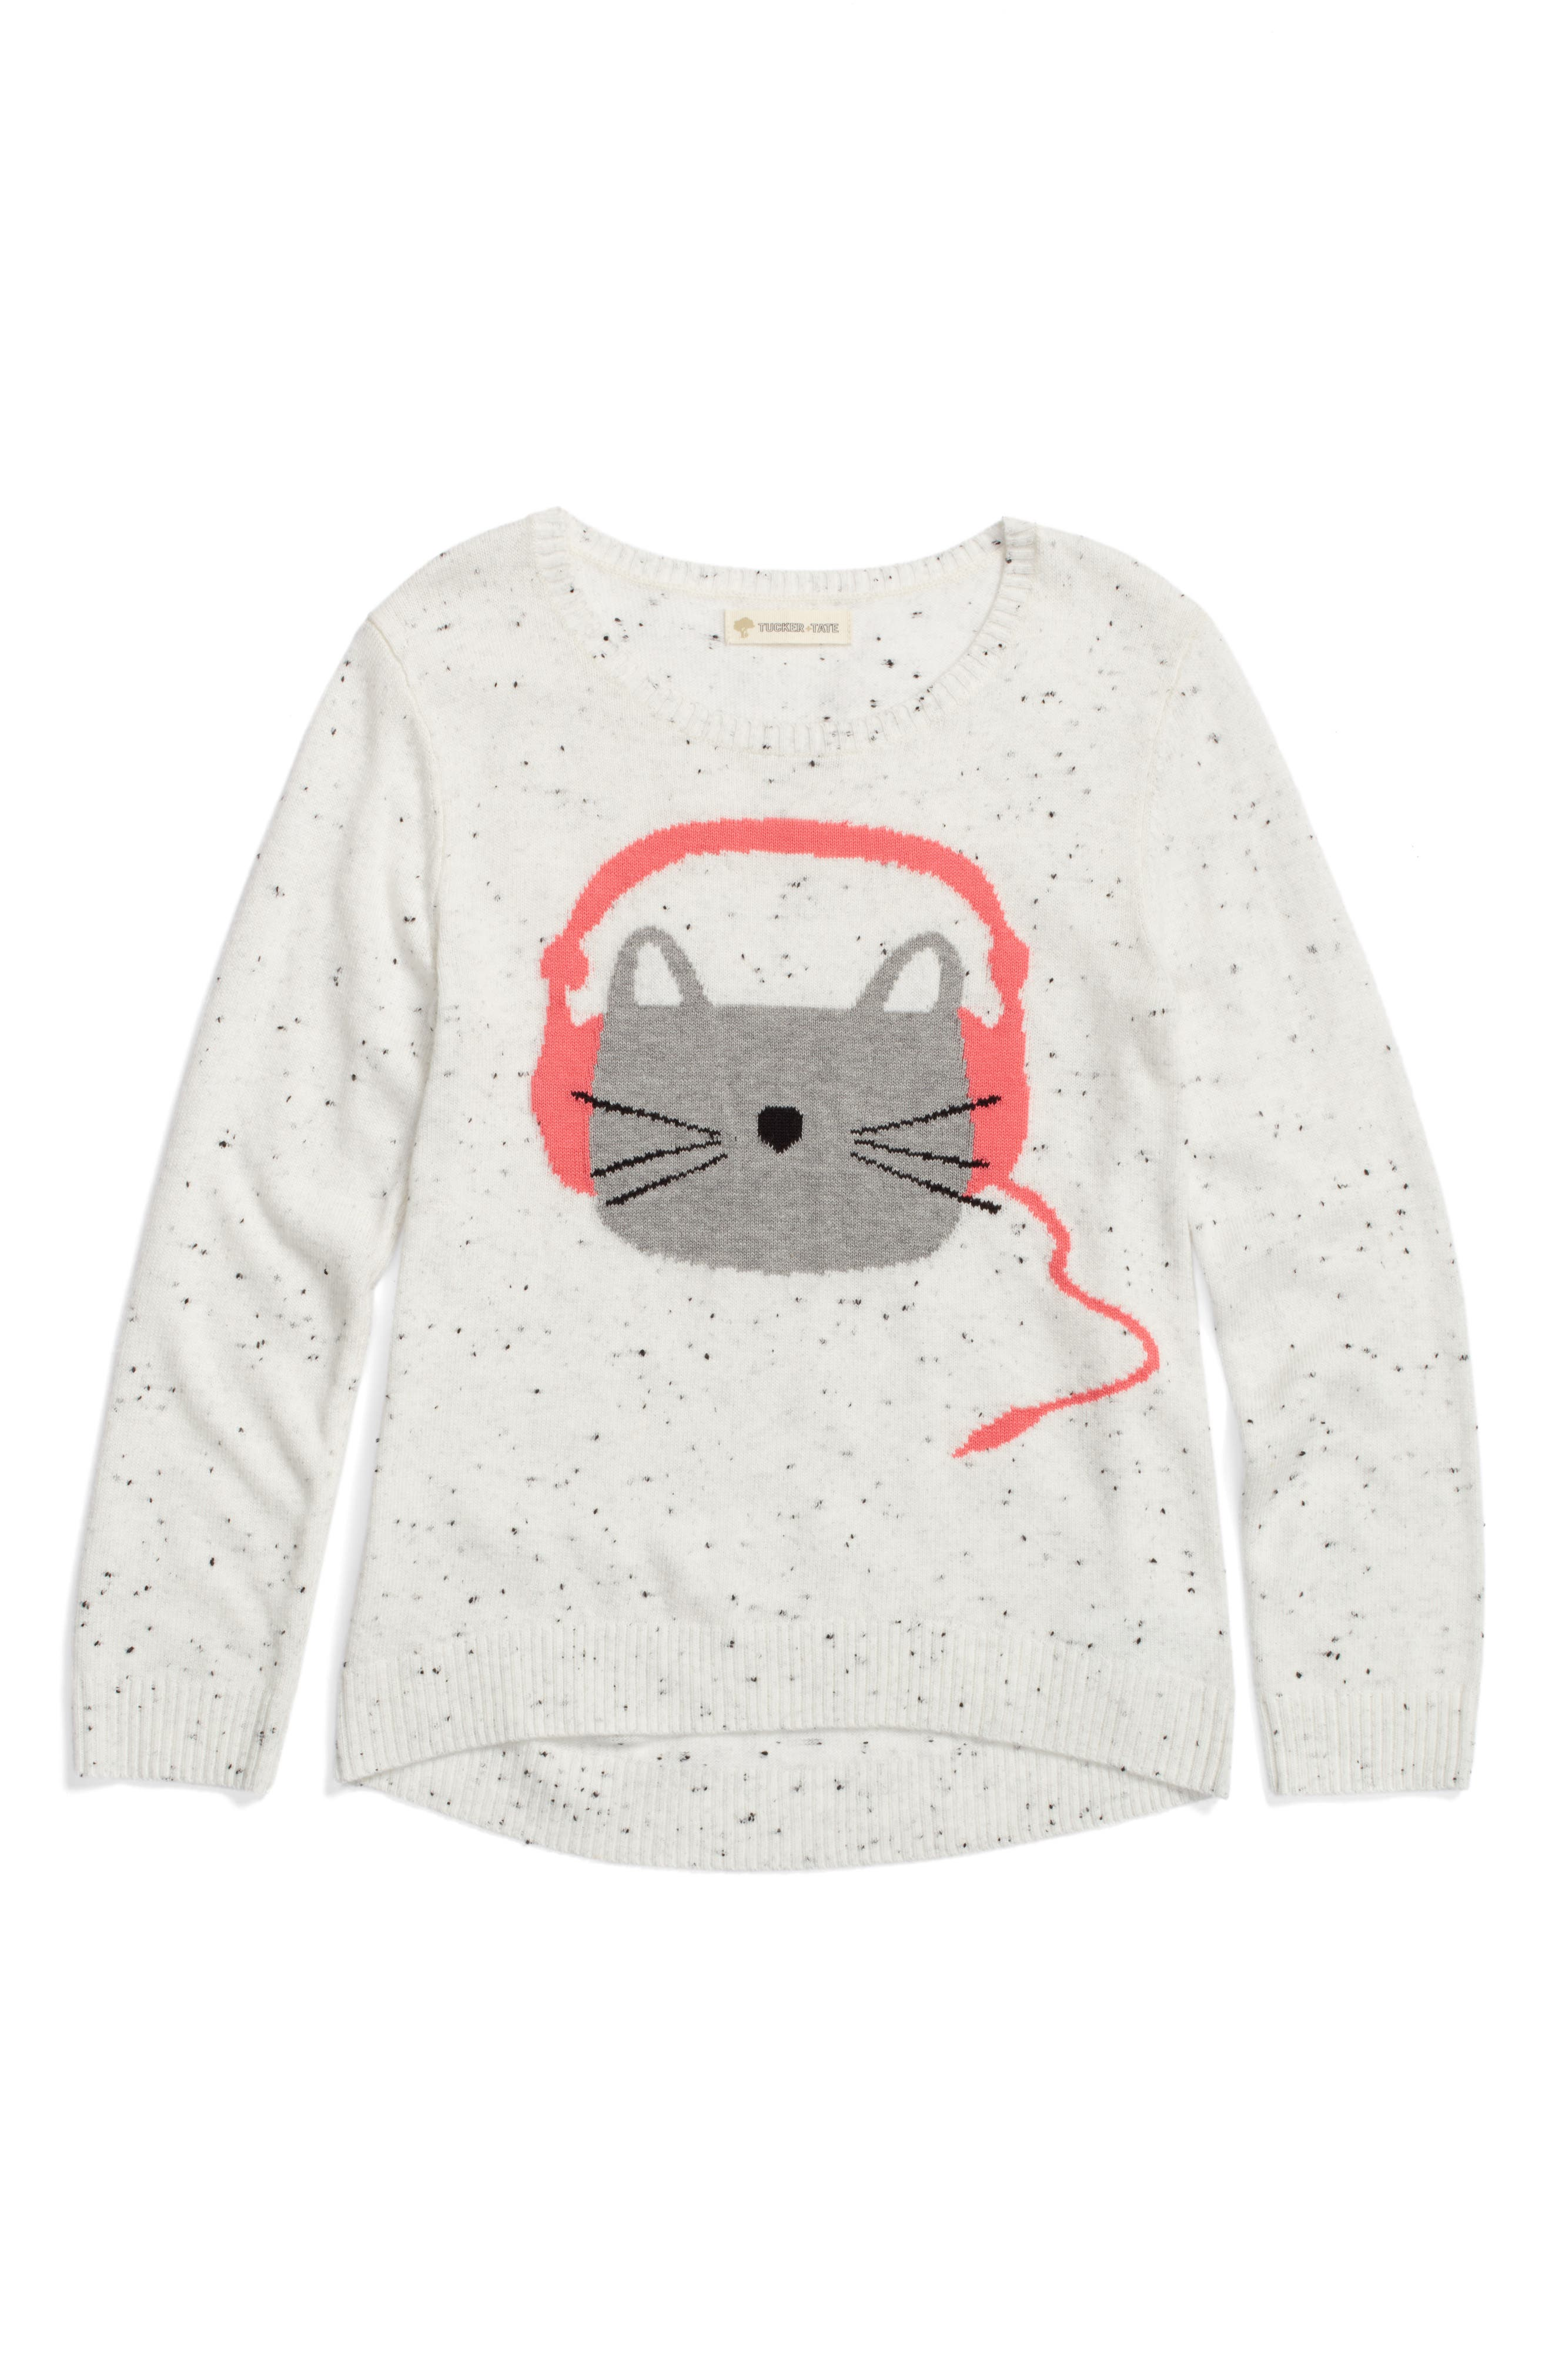 Alternate Image 1 Selected - Tucker + Tate Icon Sweater (Toddler Girls, Little Girls & Big Girls)